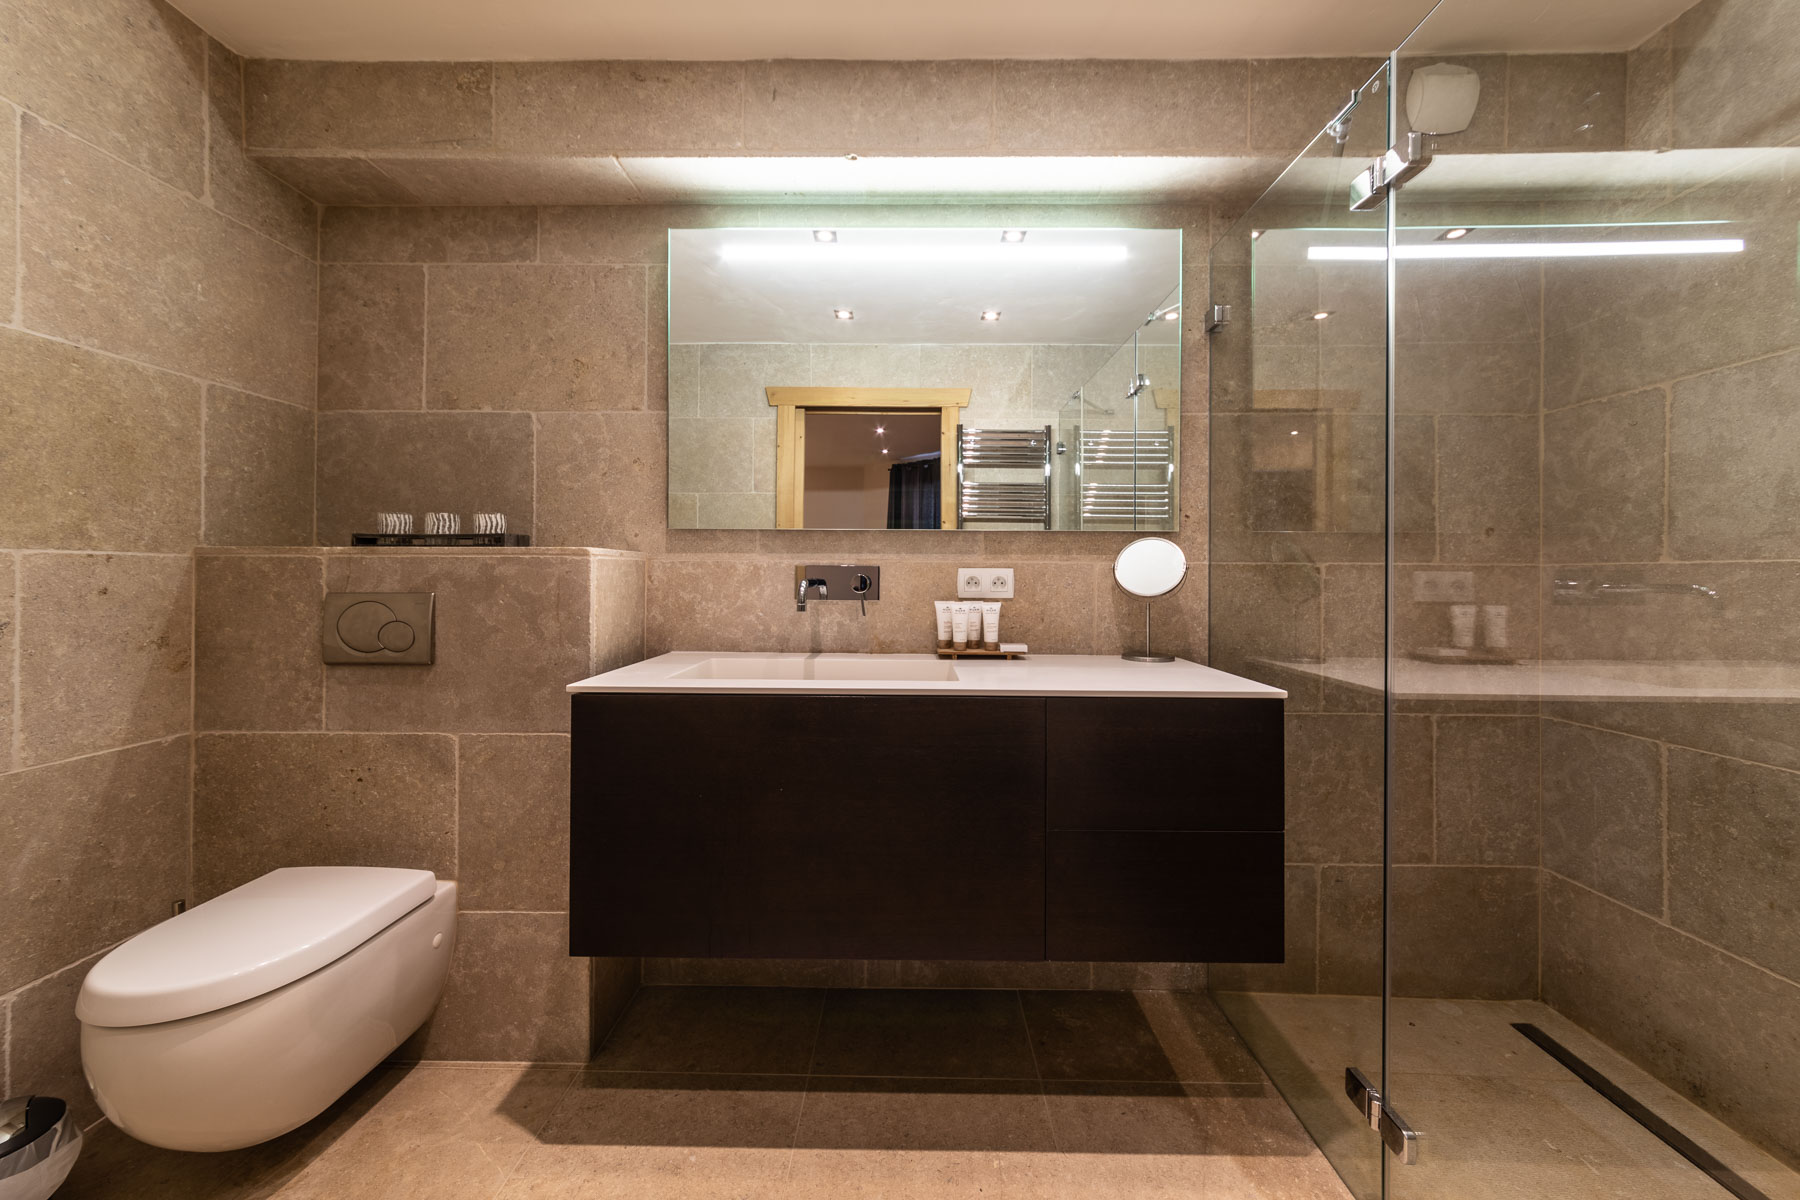 Omaroo 1 Shower Room